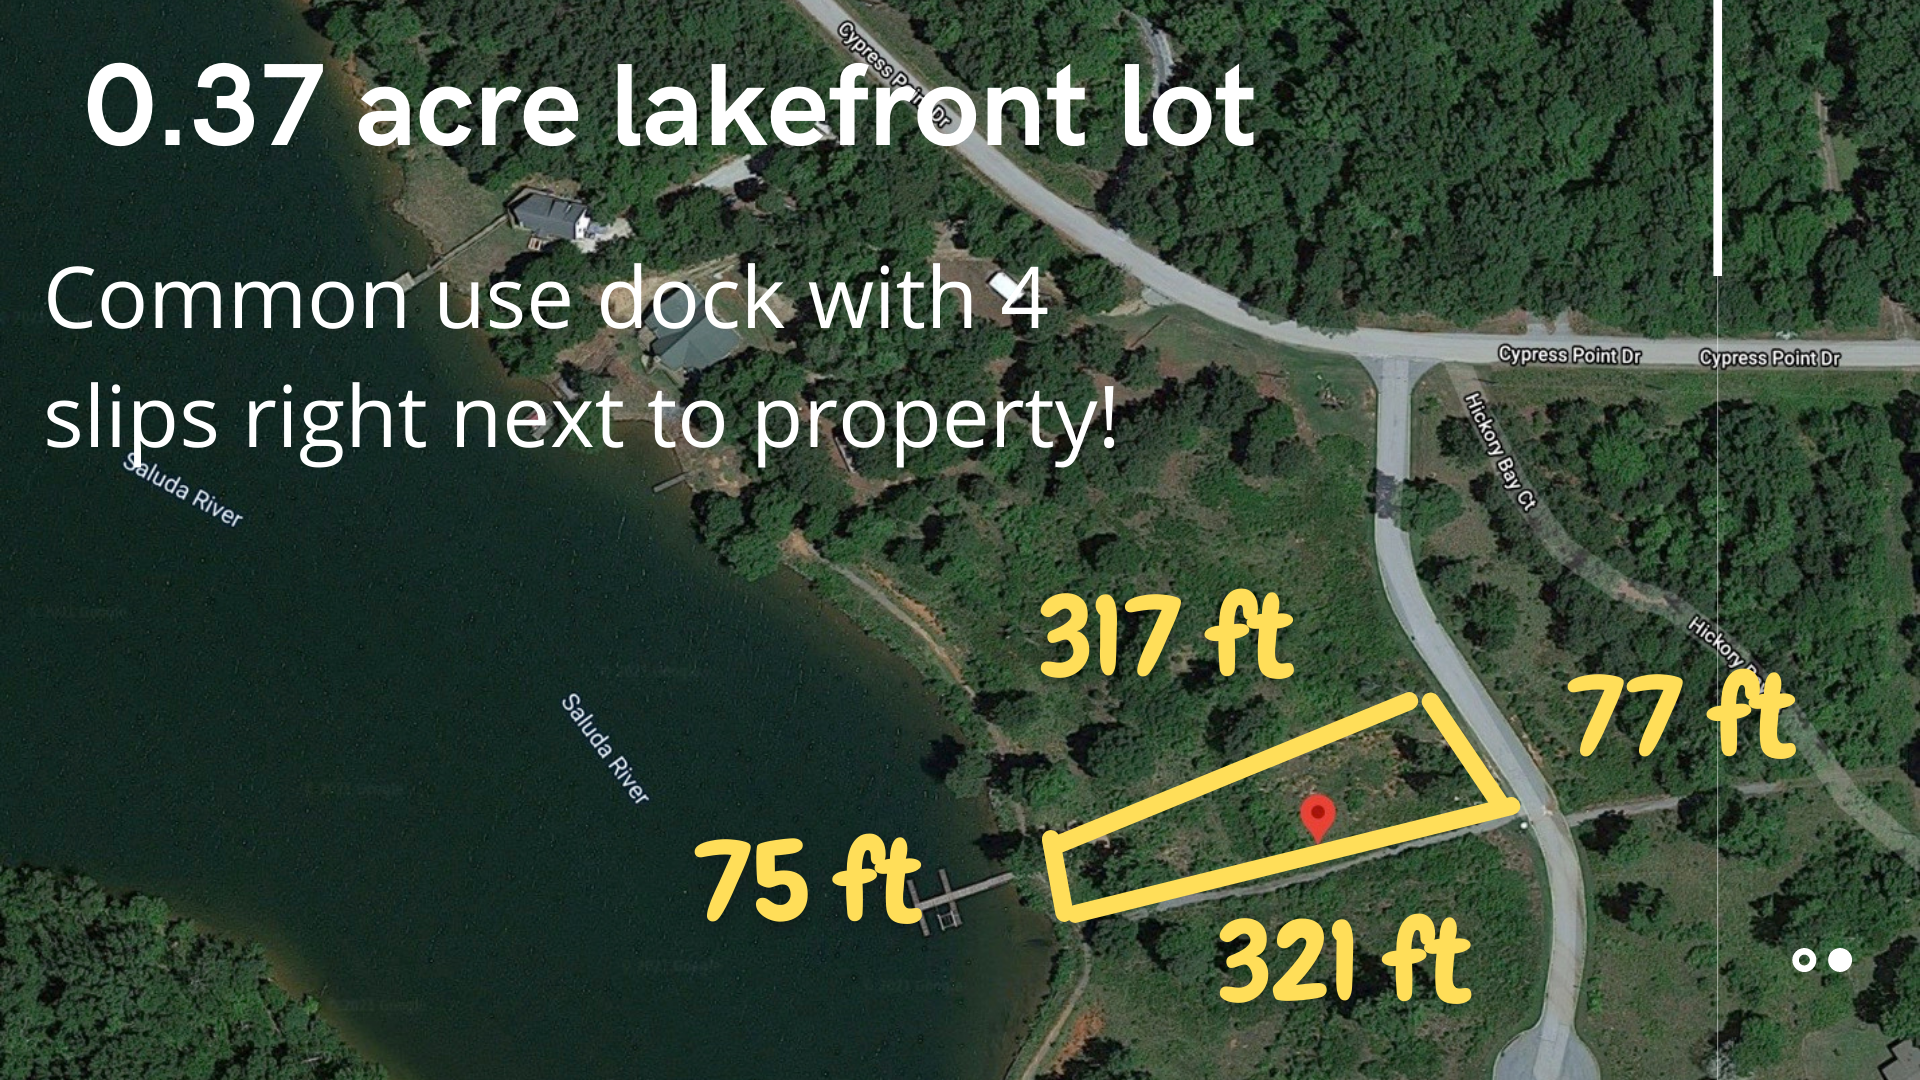 Lake Greenwood Lakefront Lot for Sale